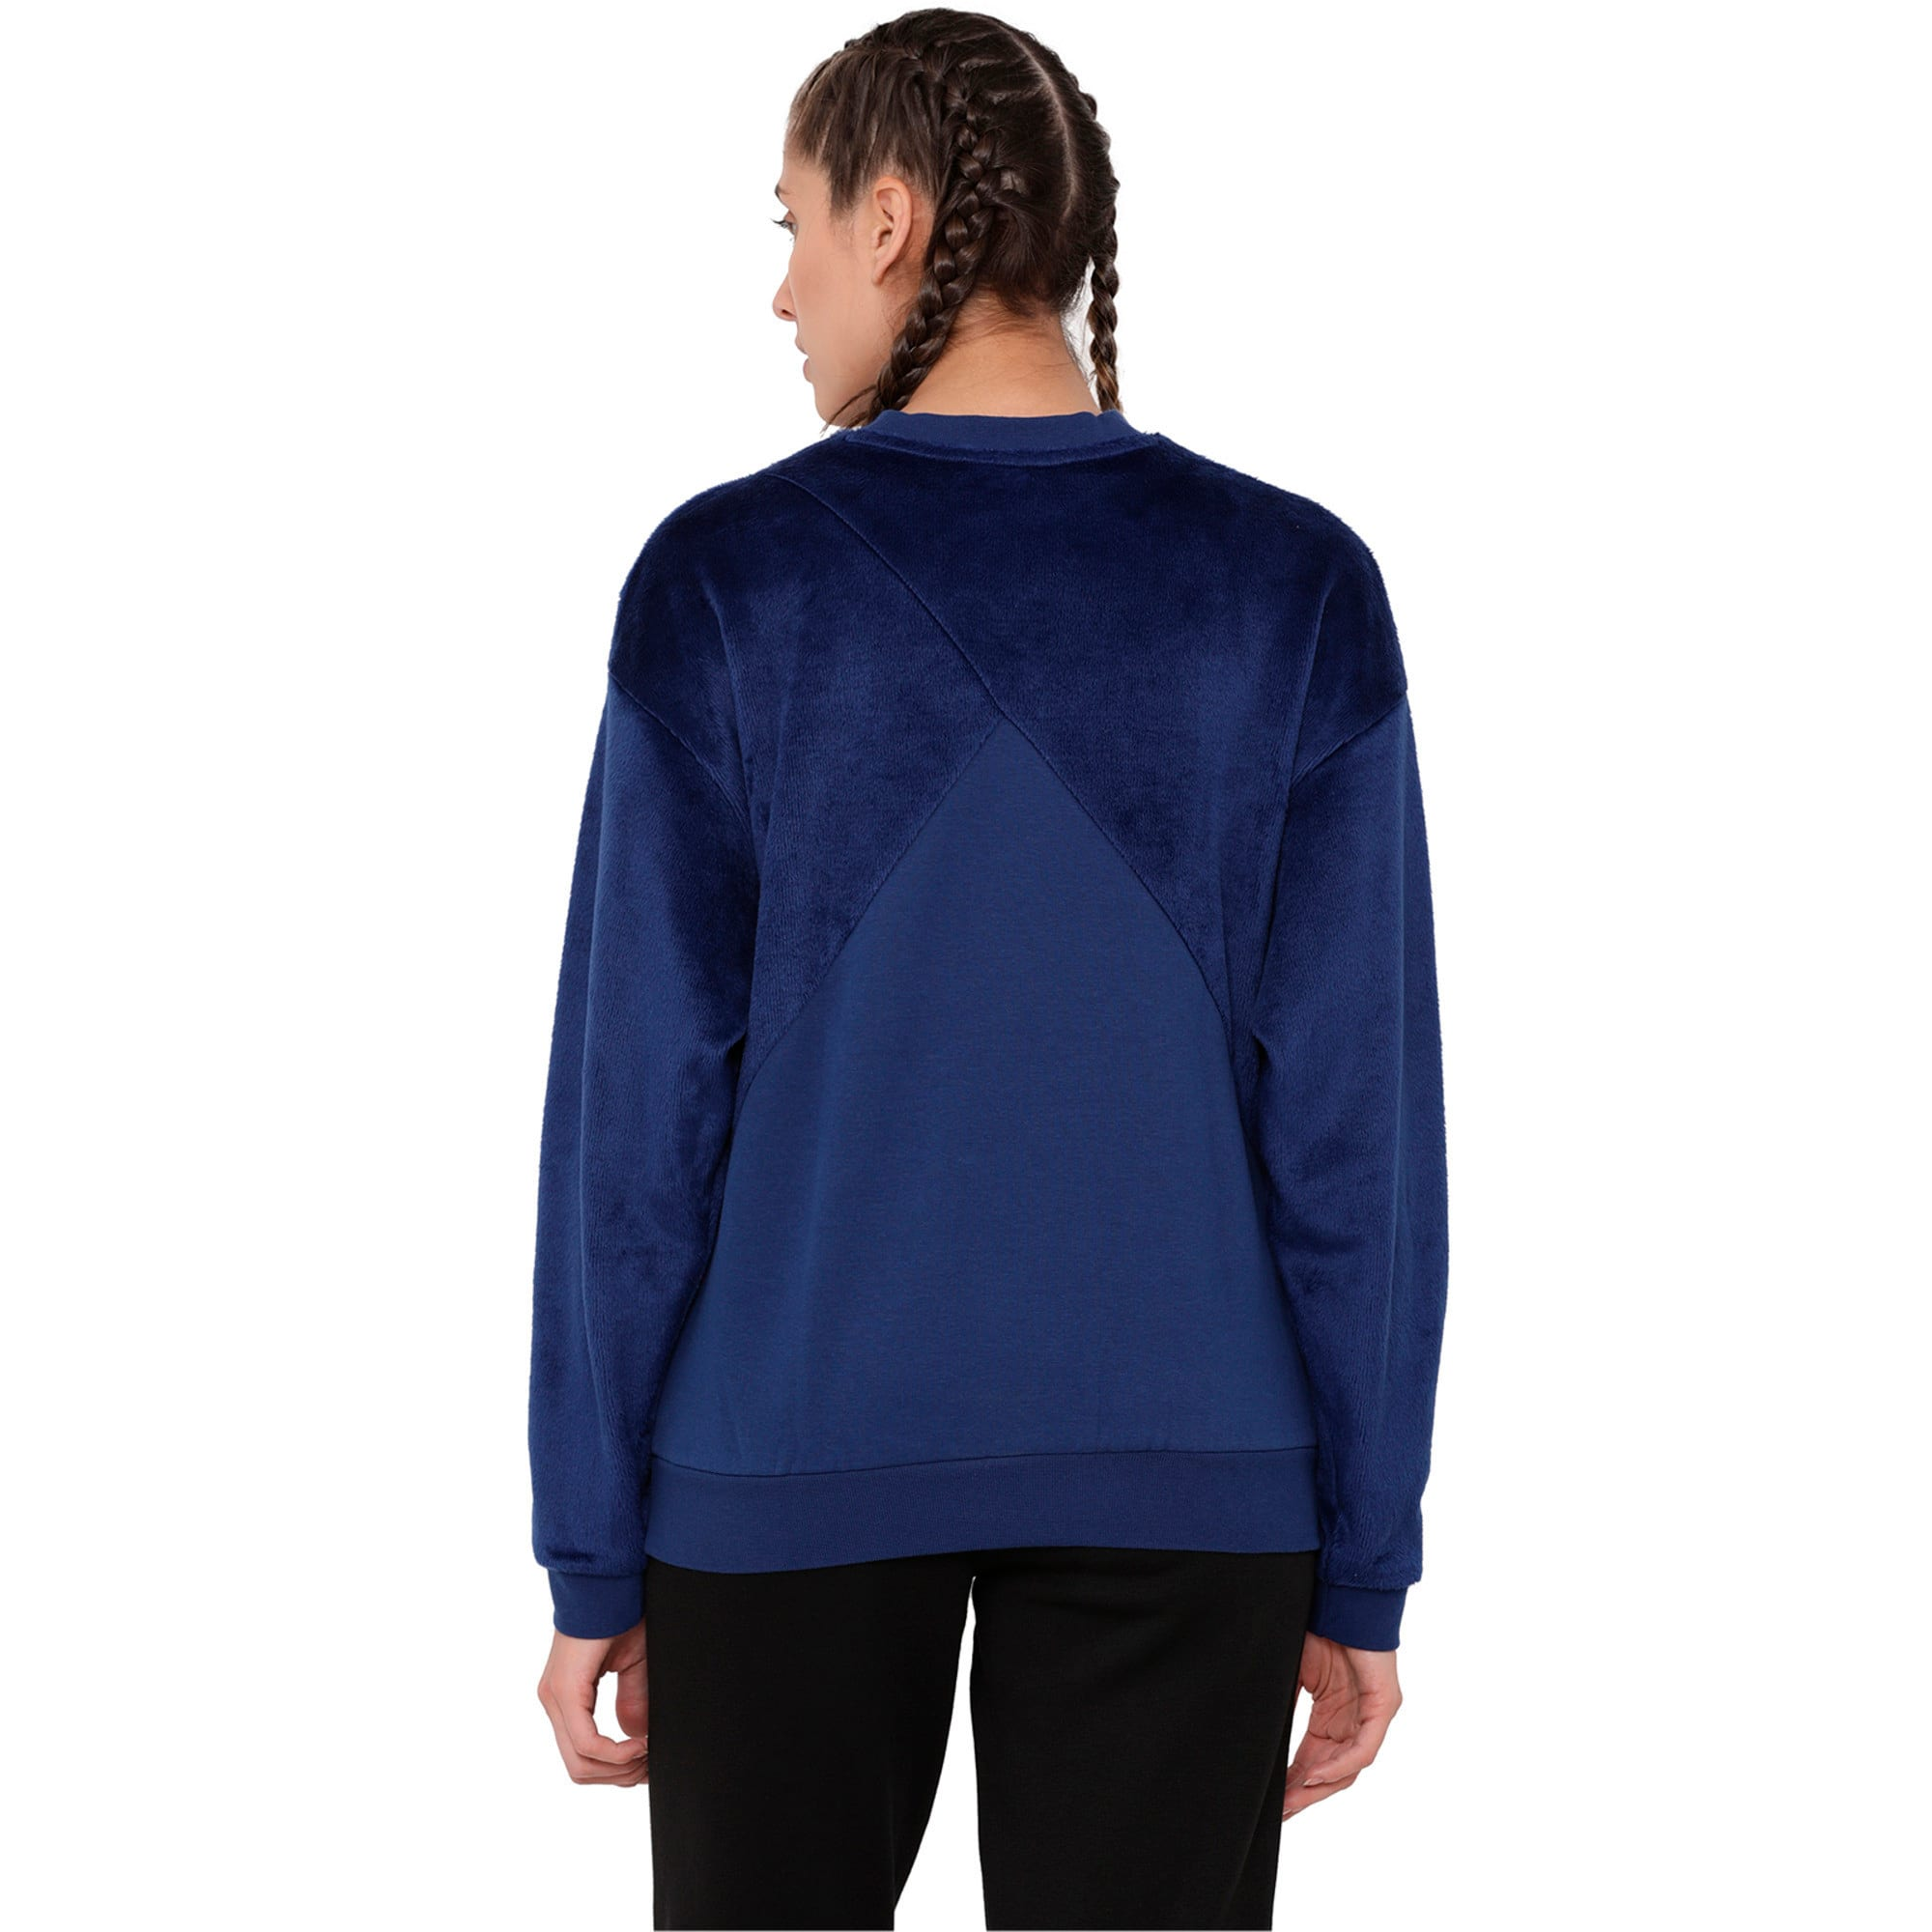 Thumbnail 2 of Archive Women's Fabric Block Sweater, Blue Depths, medium-IND